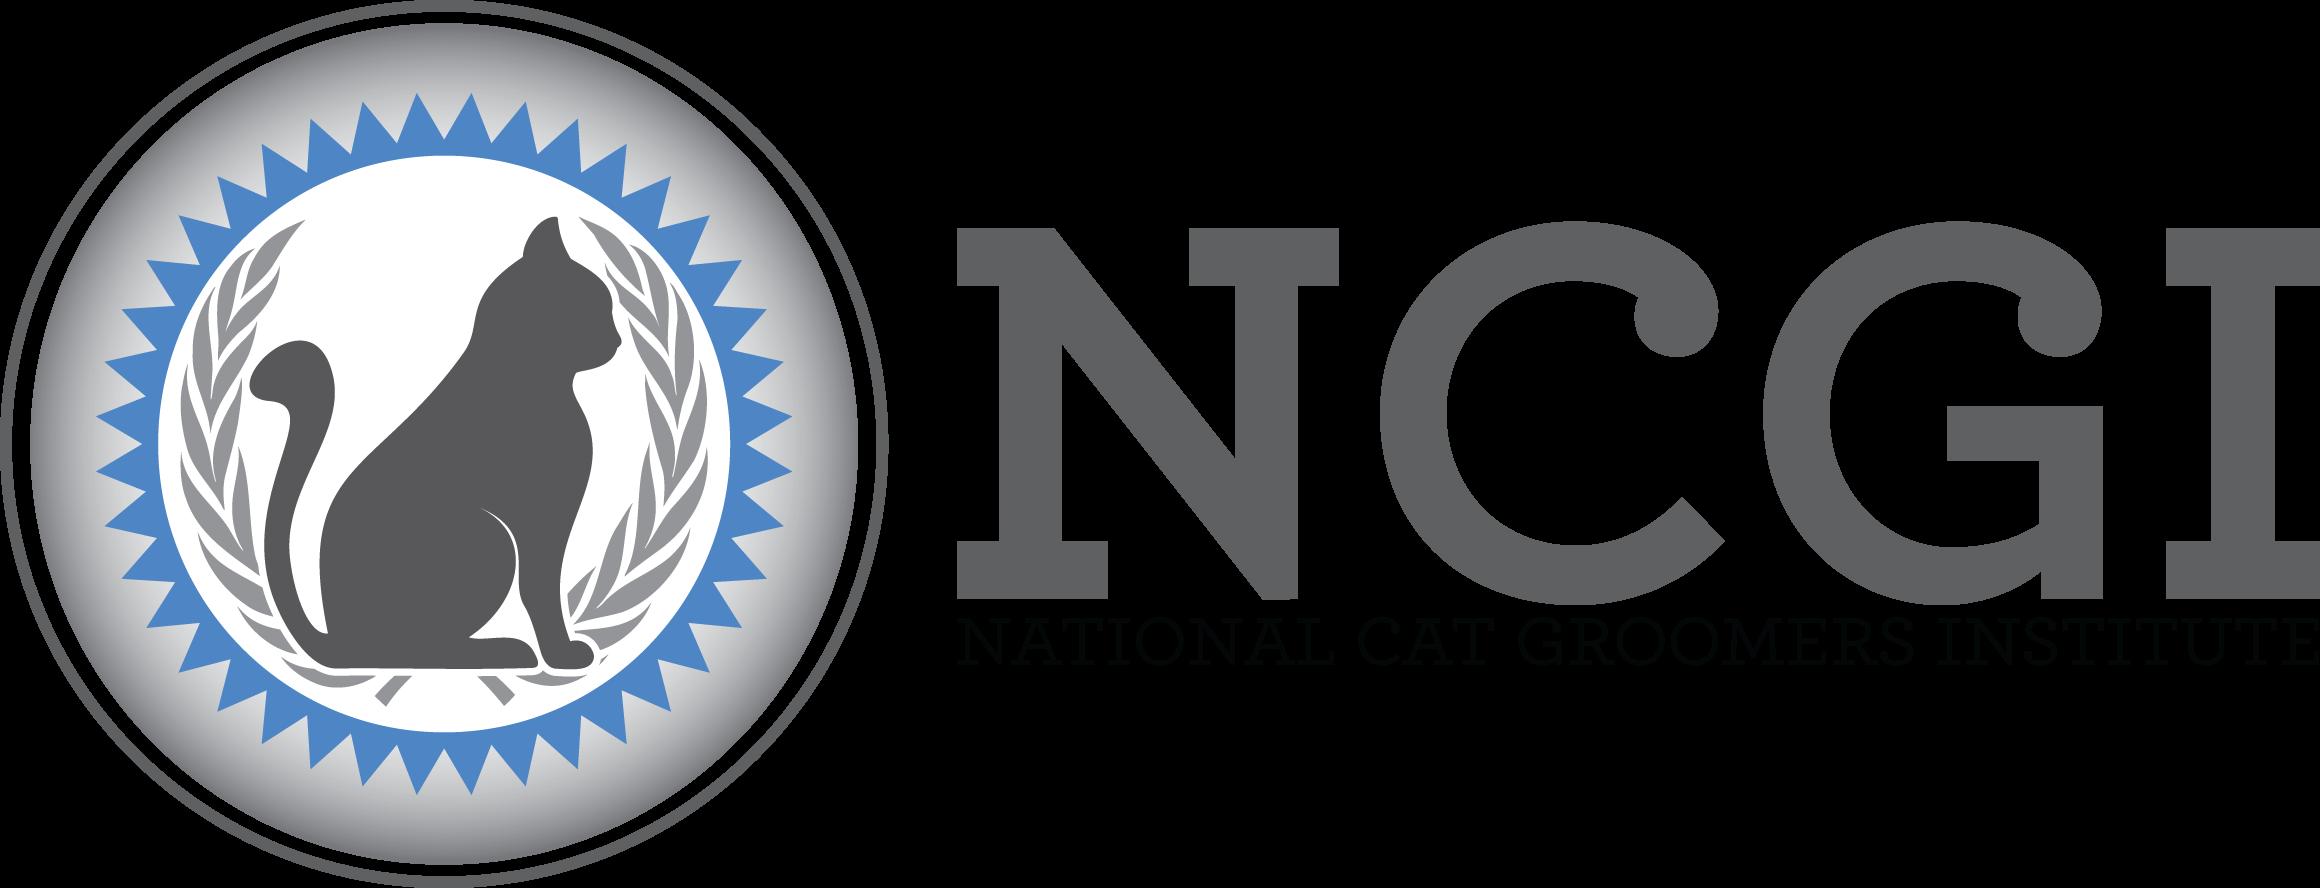 NCGI_V2_2017_4C.png